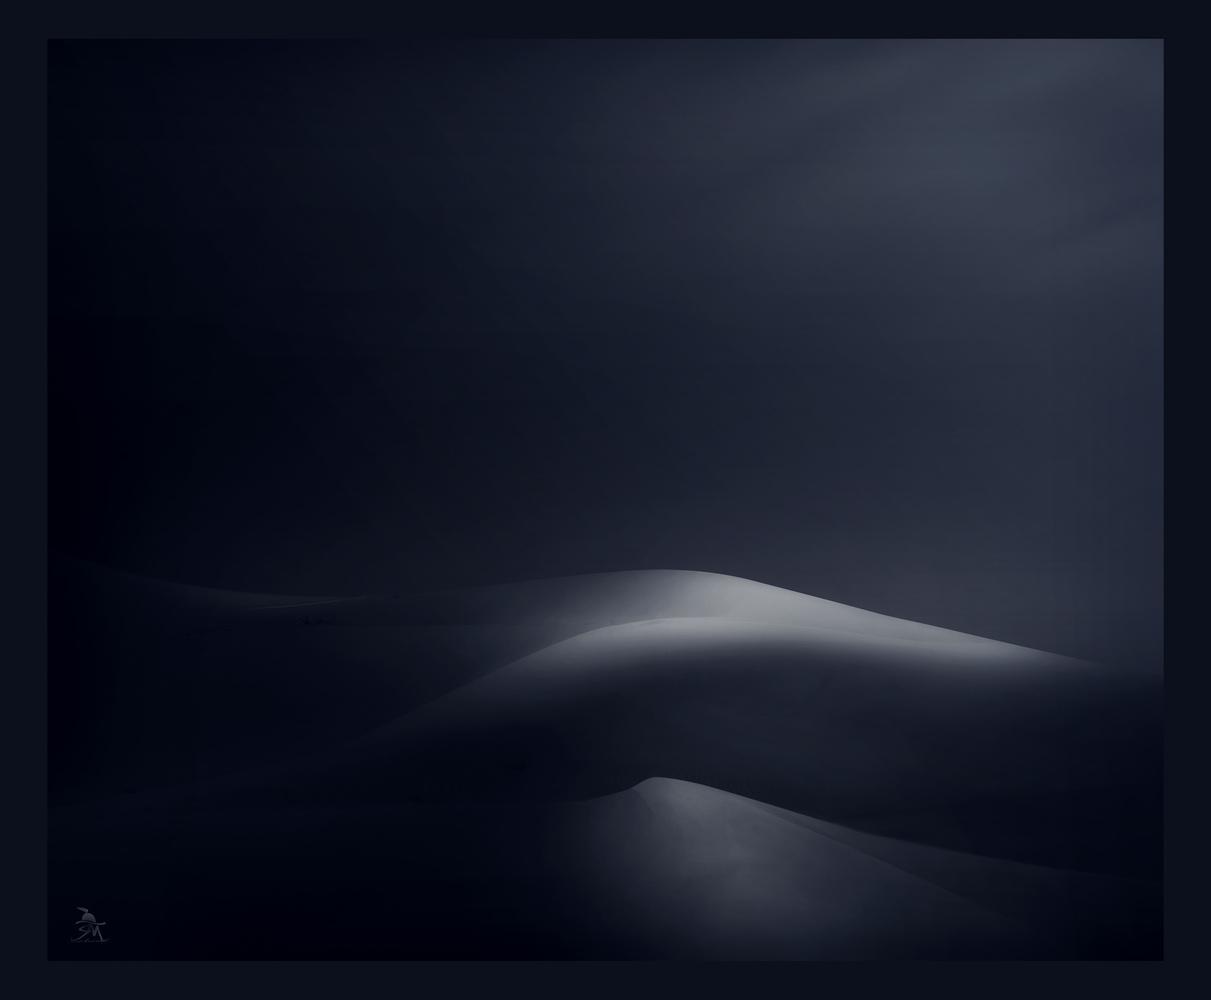 Desert Fine Dunes by Saajan Manuvel